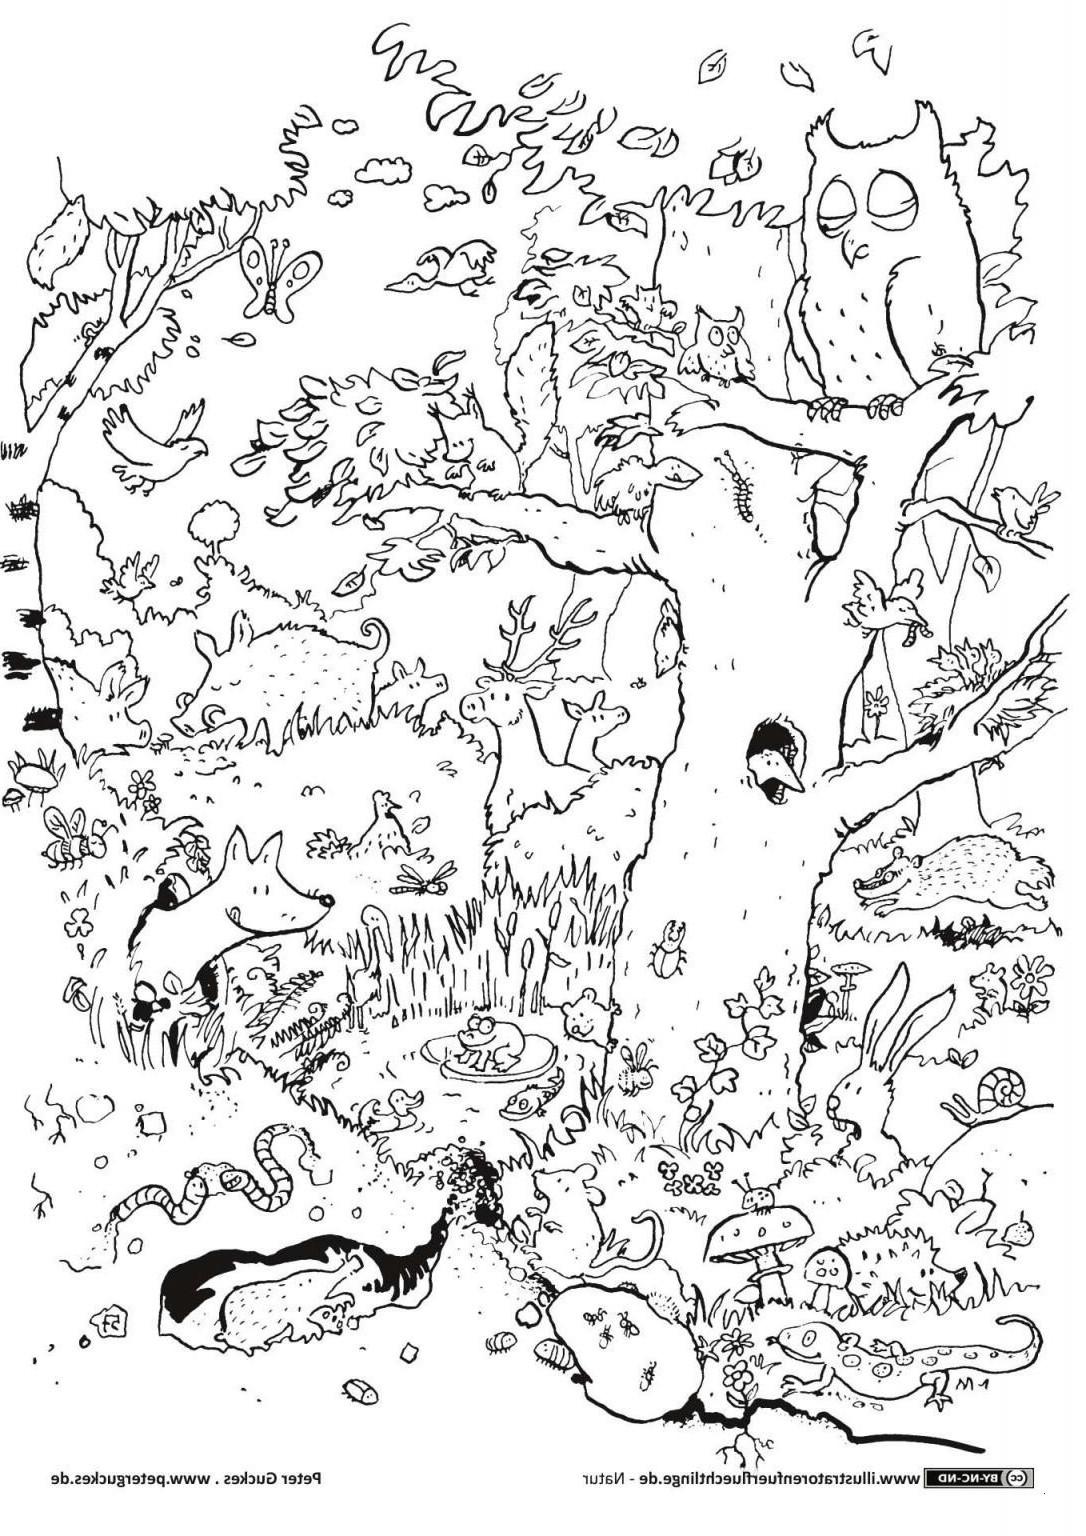 Ausmalbilder Ninjago Nya Inspirierend 36 Luxus Ausmalbilder Ninjago Kostenlos – Große Coloring Page Sammlung Stock